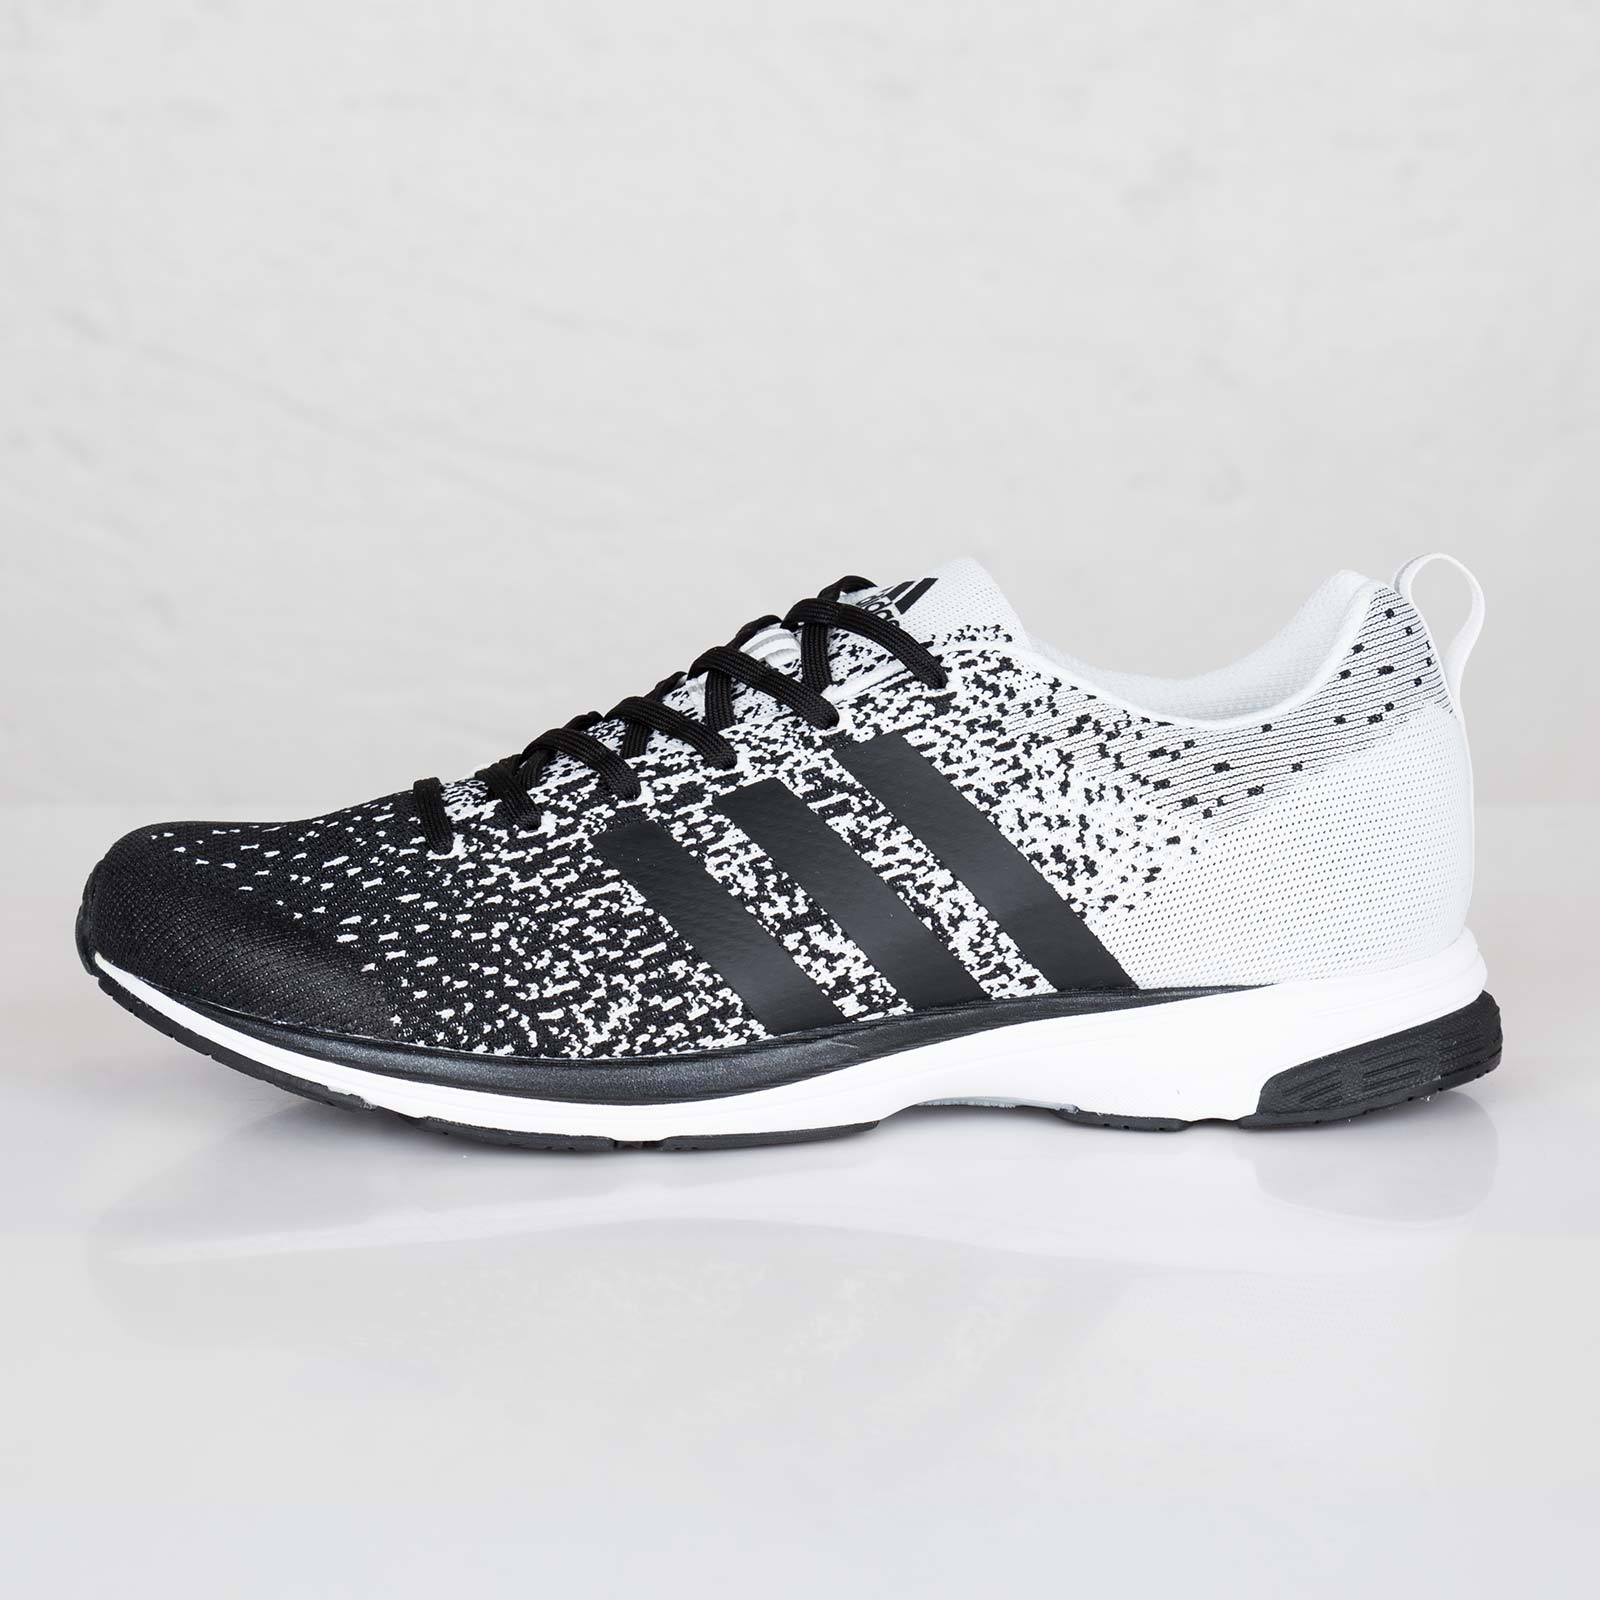 size 40 2f58d beced adidas adizero Primeknit 2.0 - Q21957 - Sneakersnstuff   sneakers    streetwear online since 1999